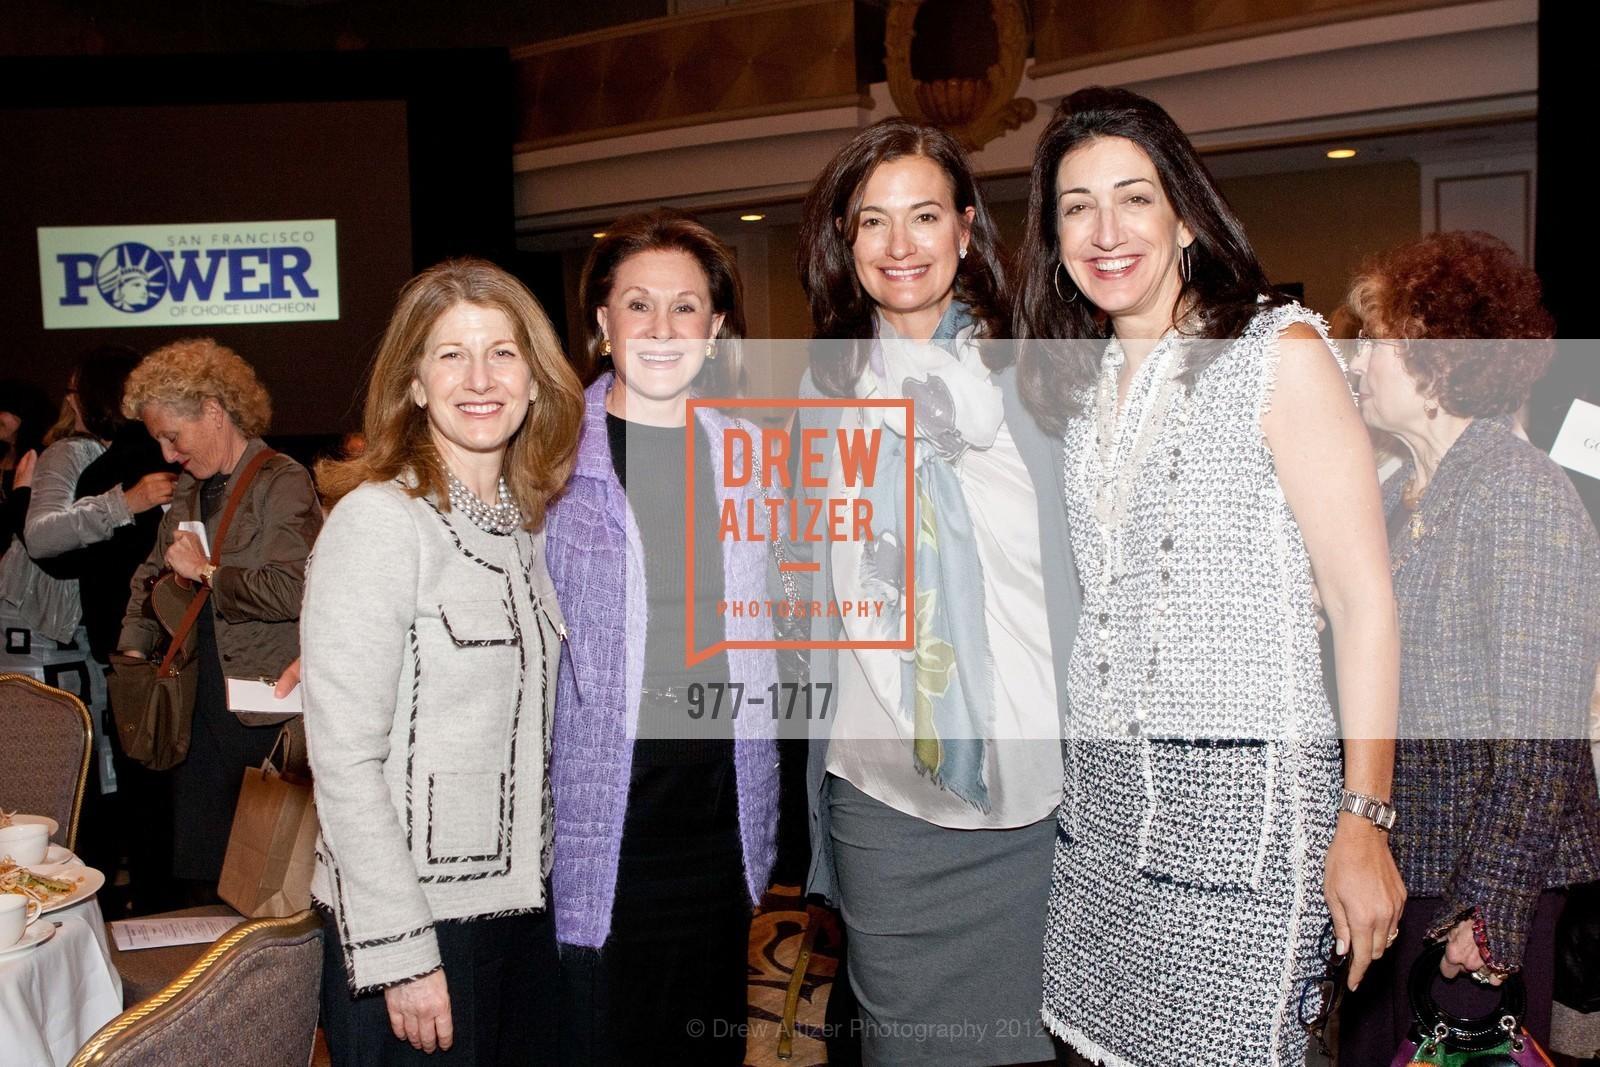 Diana Sansberg, Lucie Weissman, Angela Cohan, Pam Baer, Photo #977-1717